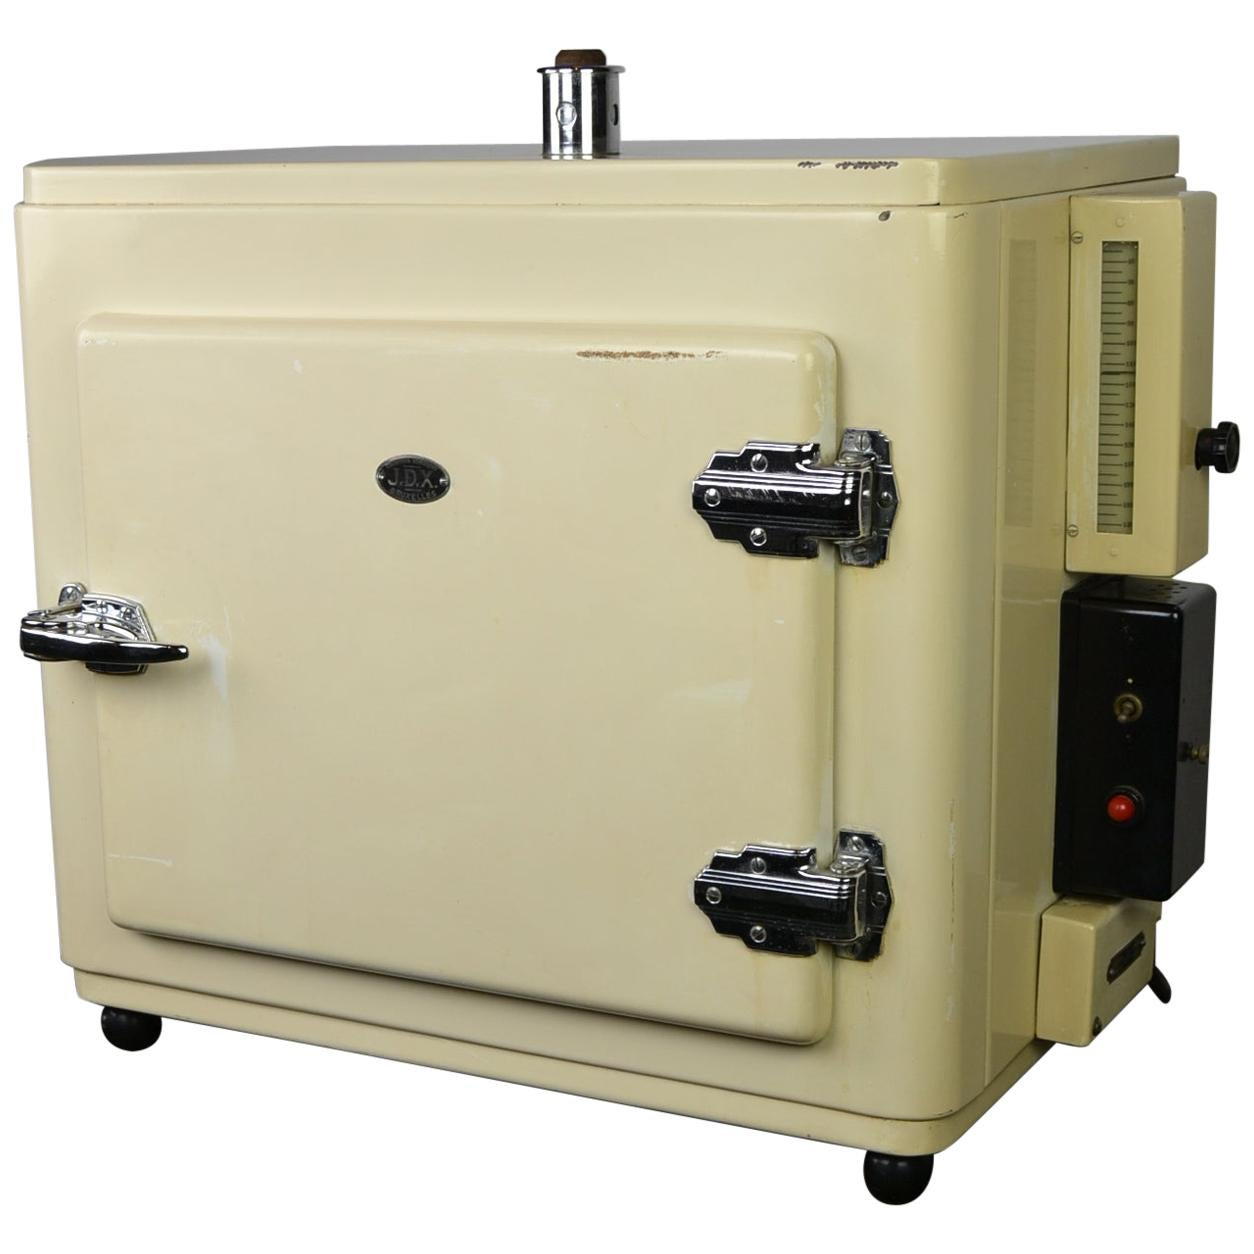 1950s Metal Sterilizer Cabinet, Medical Equipment